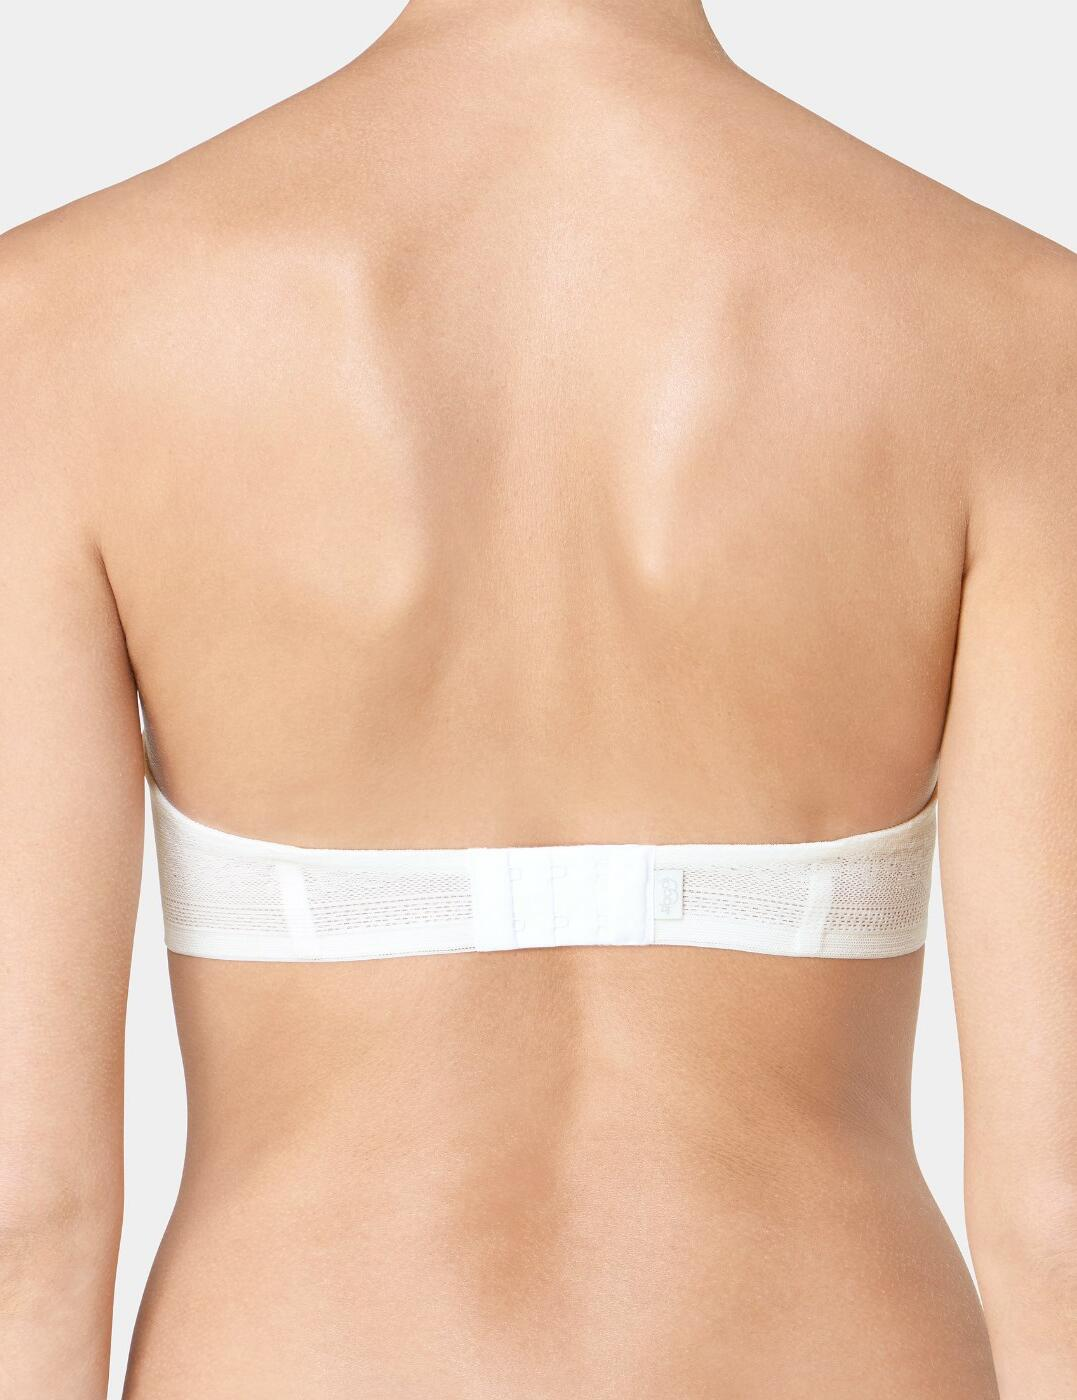 Sloggi Zero Lace Strapless Bra 10186066 Underwired Lightly Padded Womens Bras